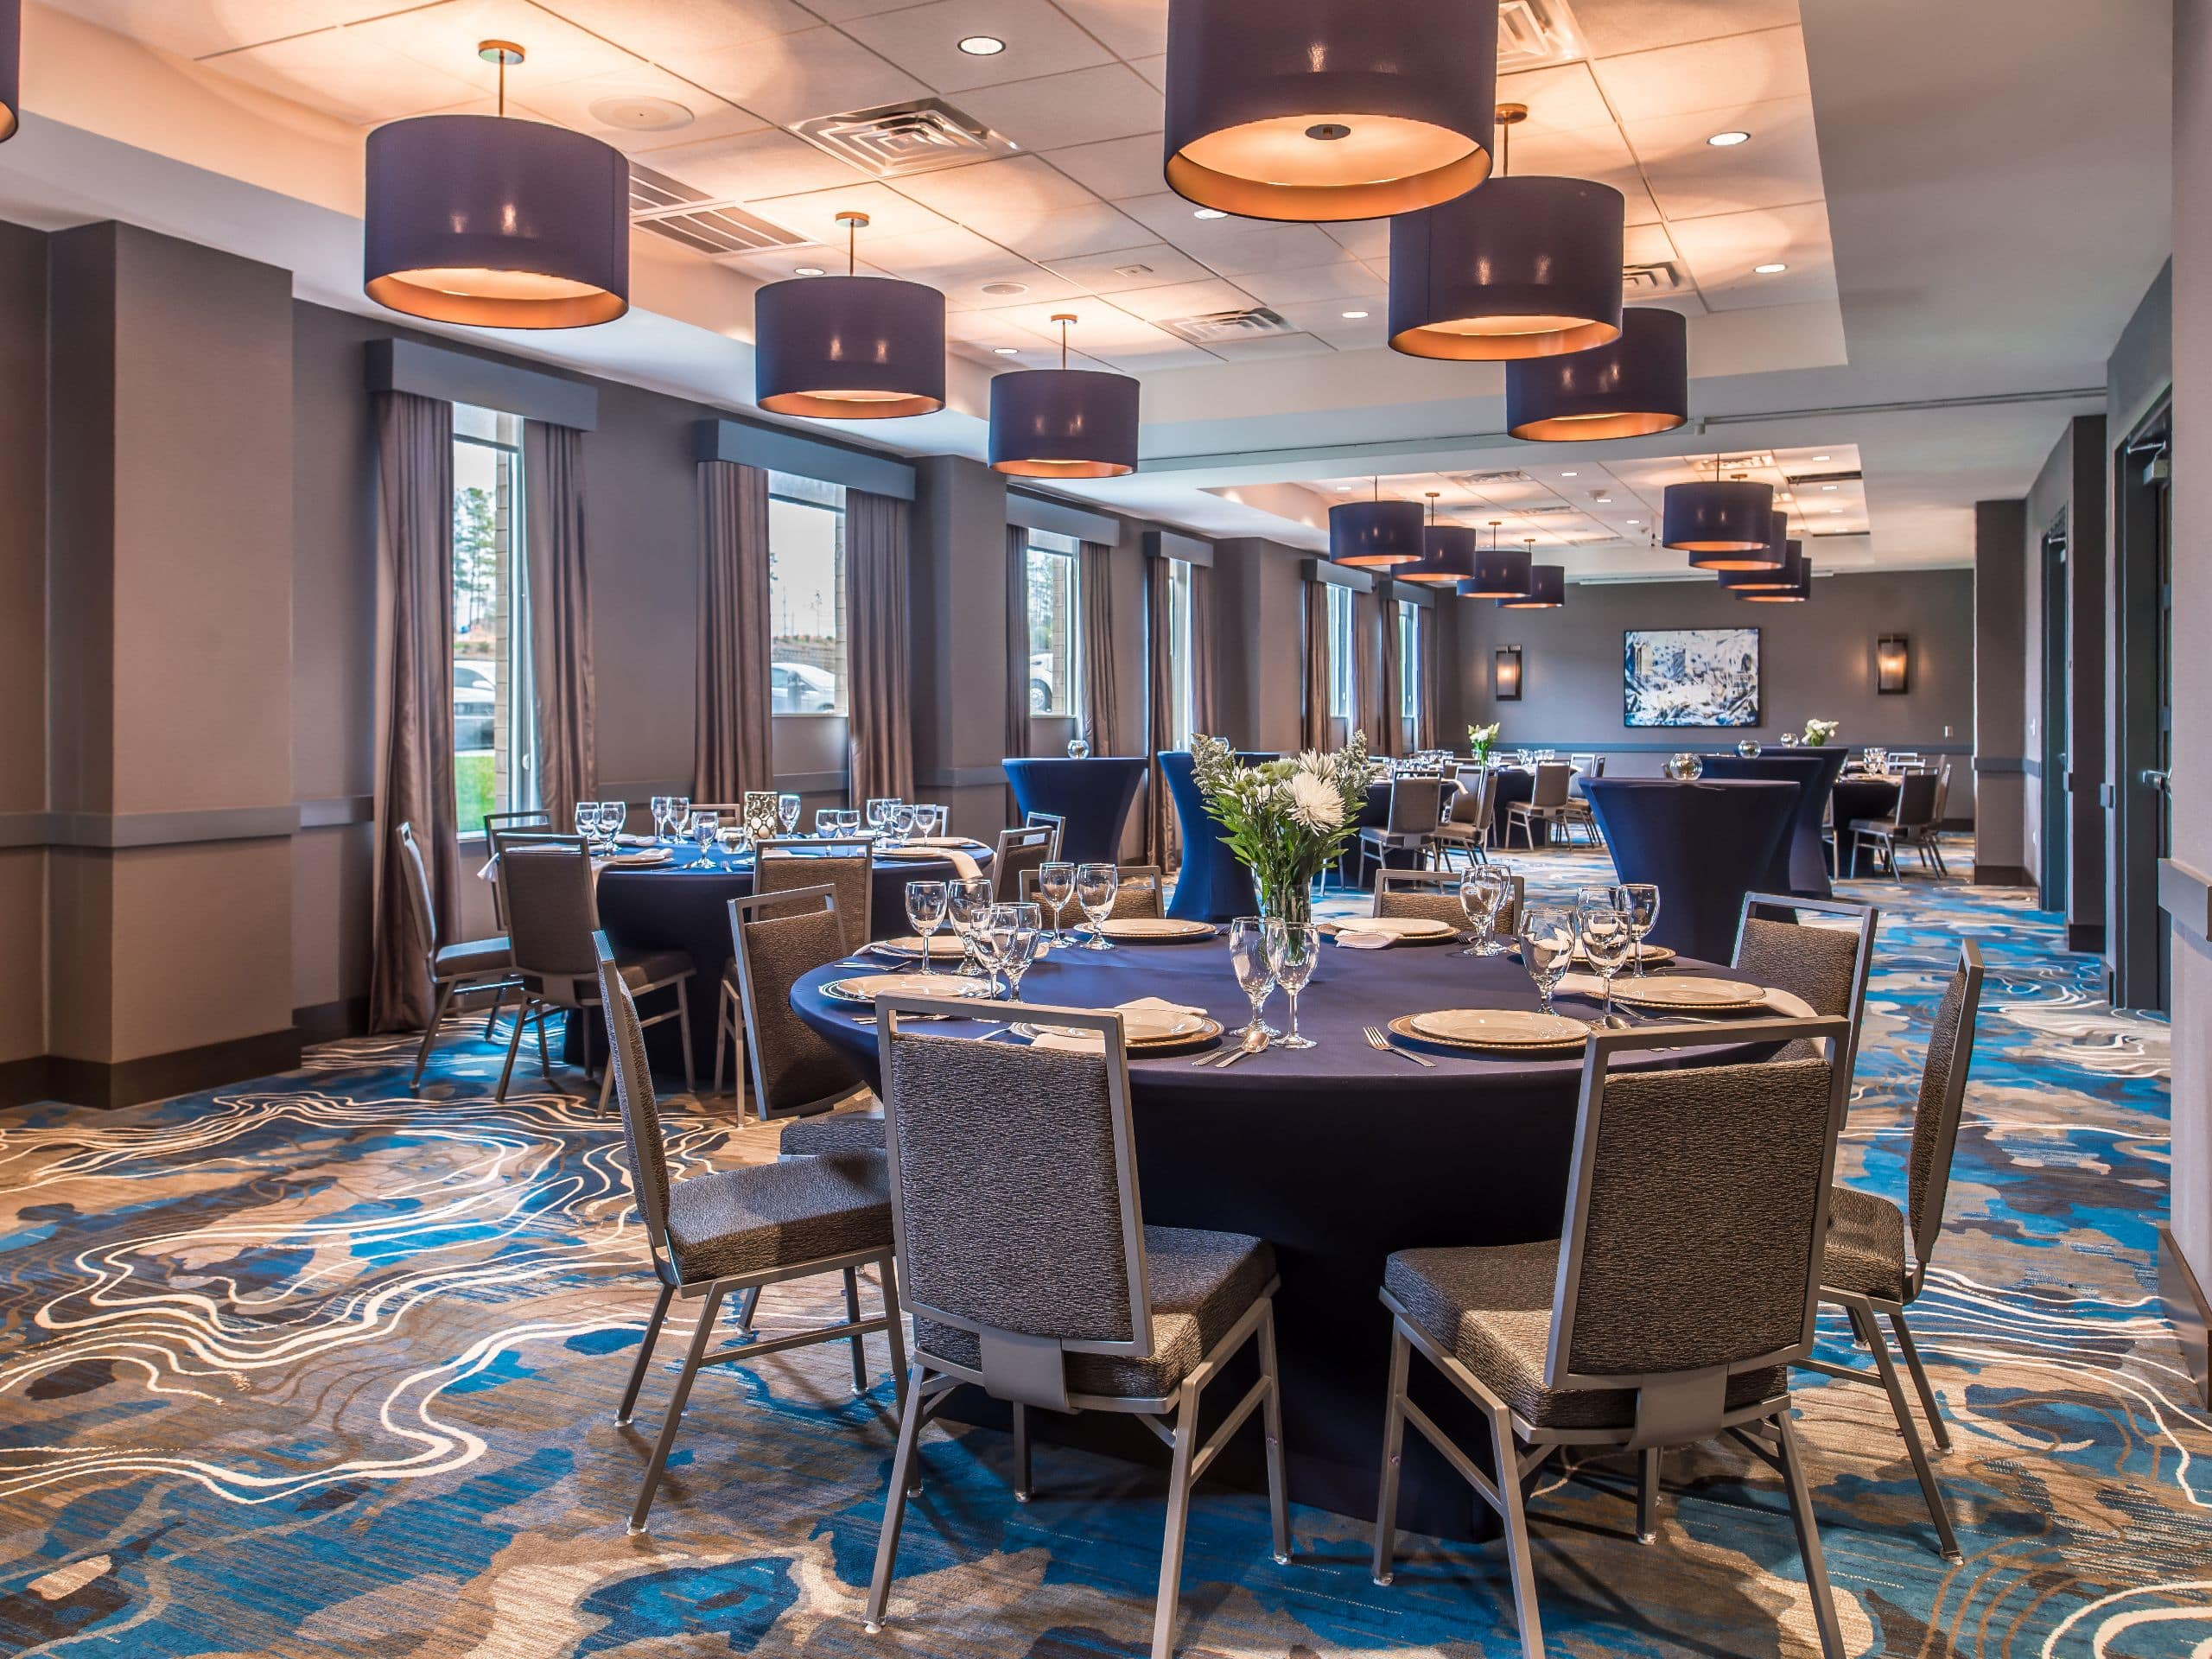 Newest Raleigh Brier Creek Hotel Accommodations Hyatt House Rdu